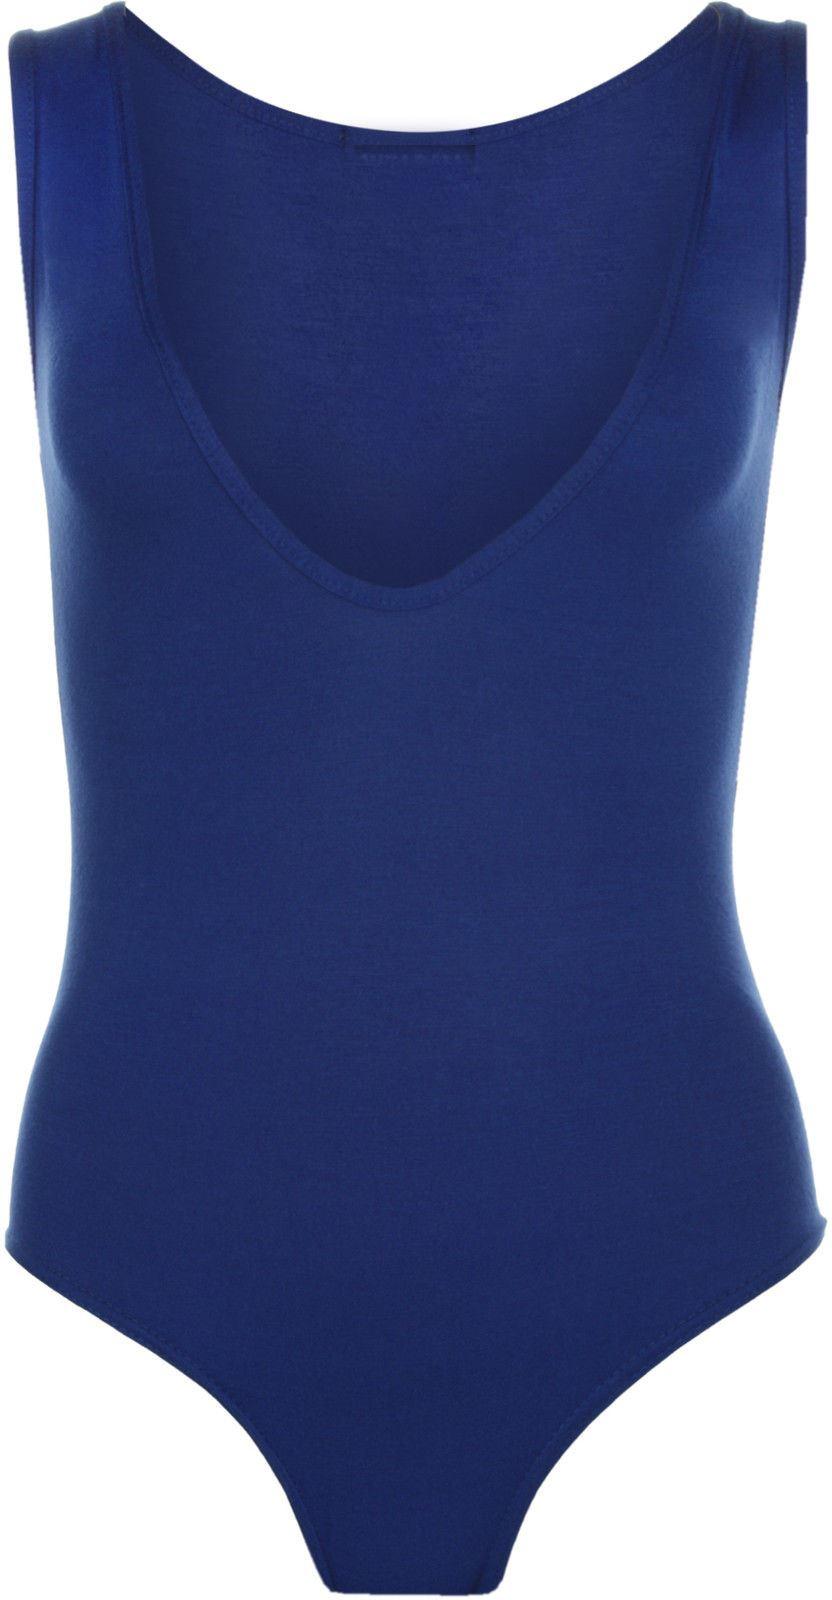 ae6b3da97b New Womens Ladies Deep V Neck Plain Bodysuit Sleeveless Stretch Leotard  Vest Top